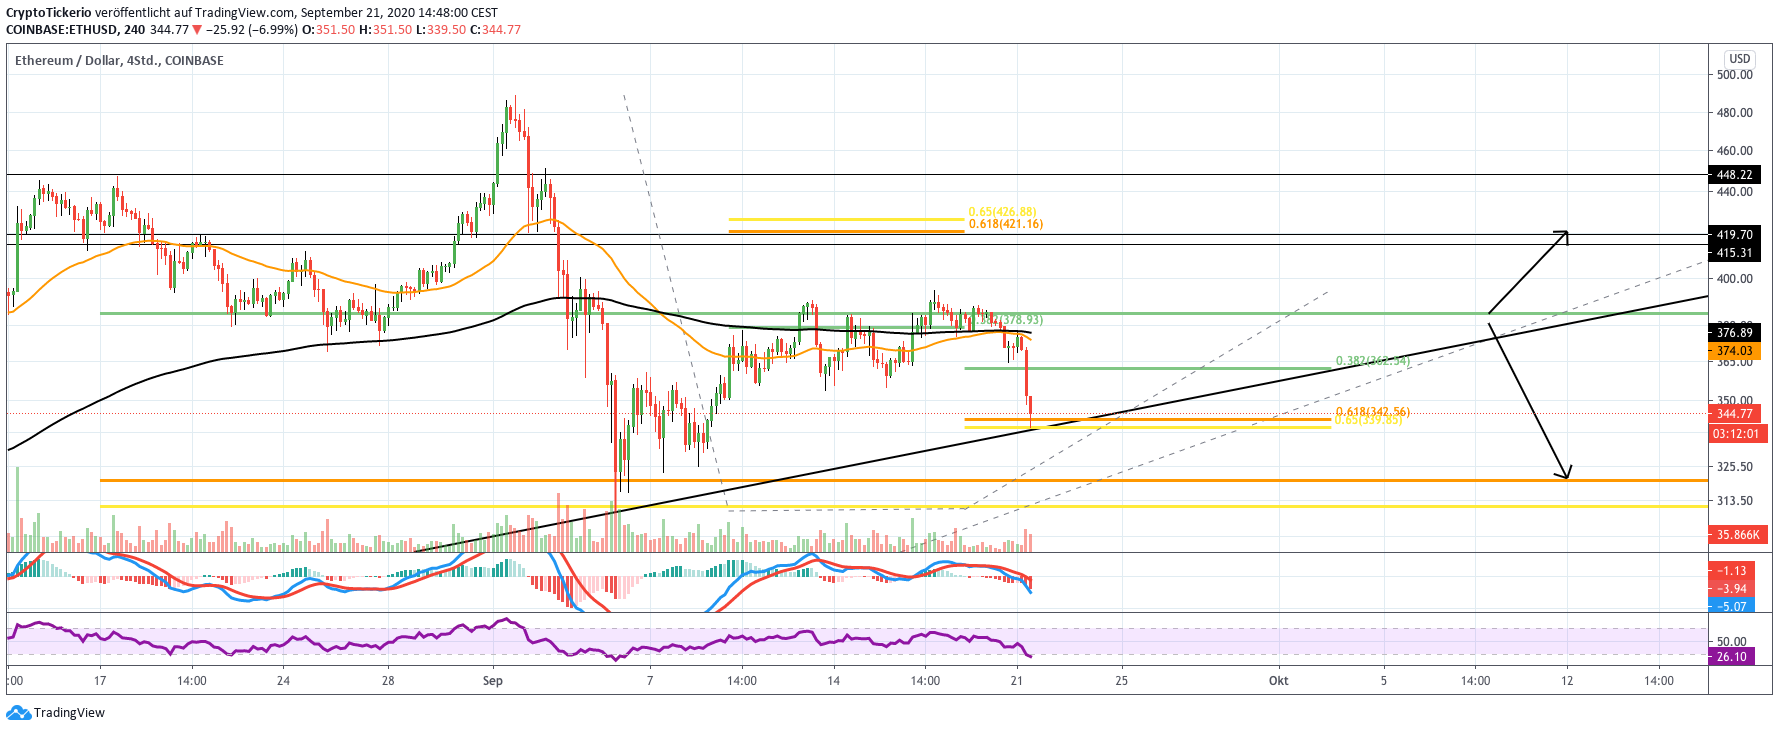 ETH/USD 4H price chart analysis